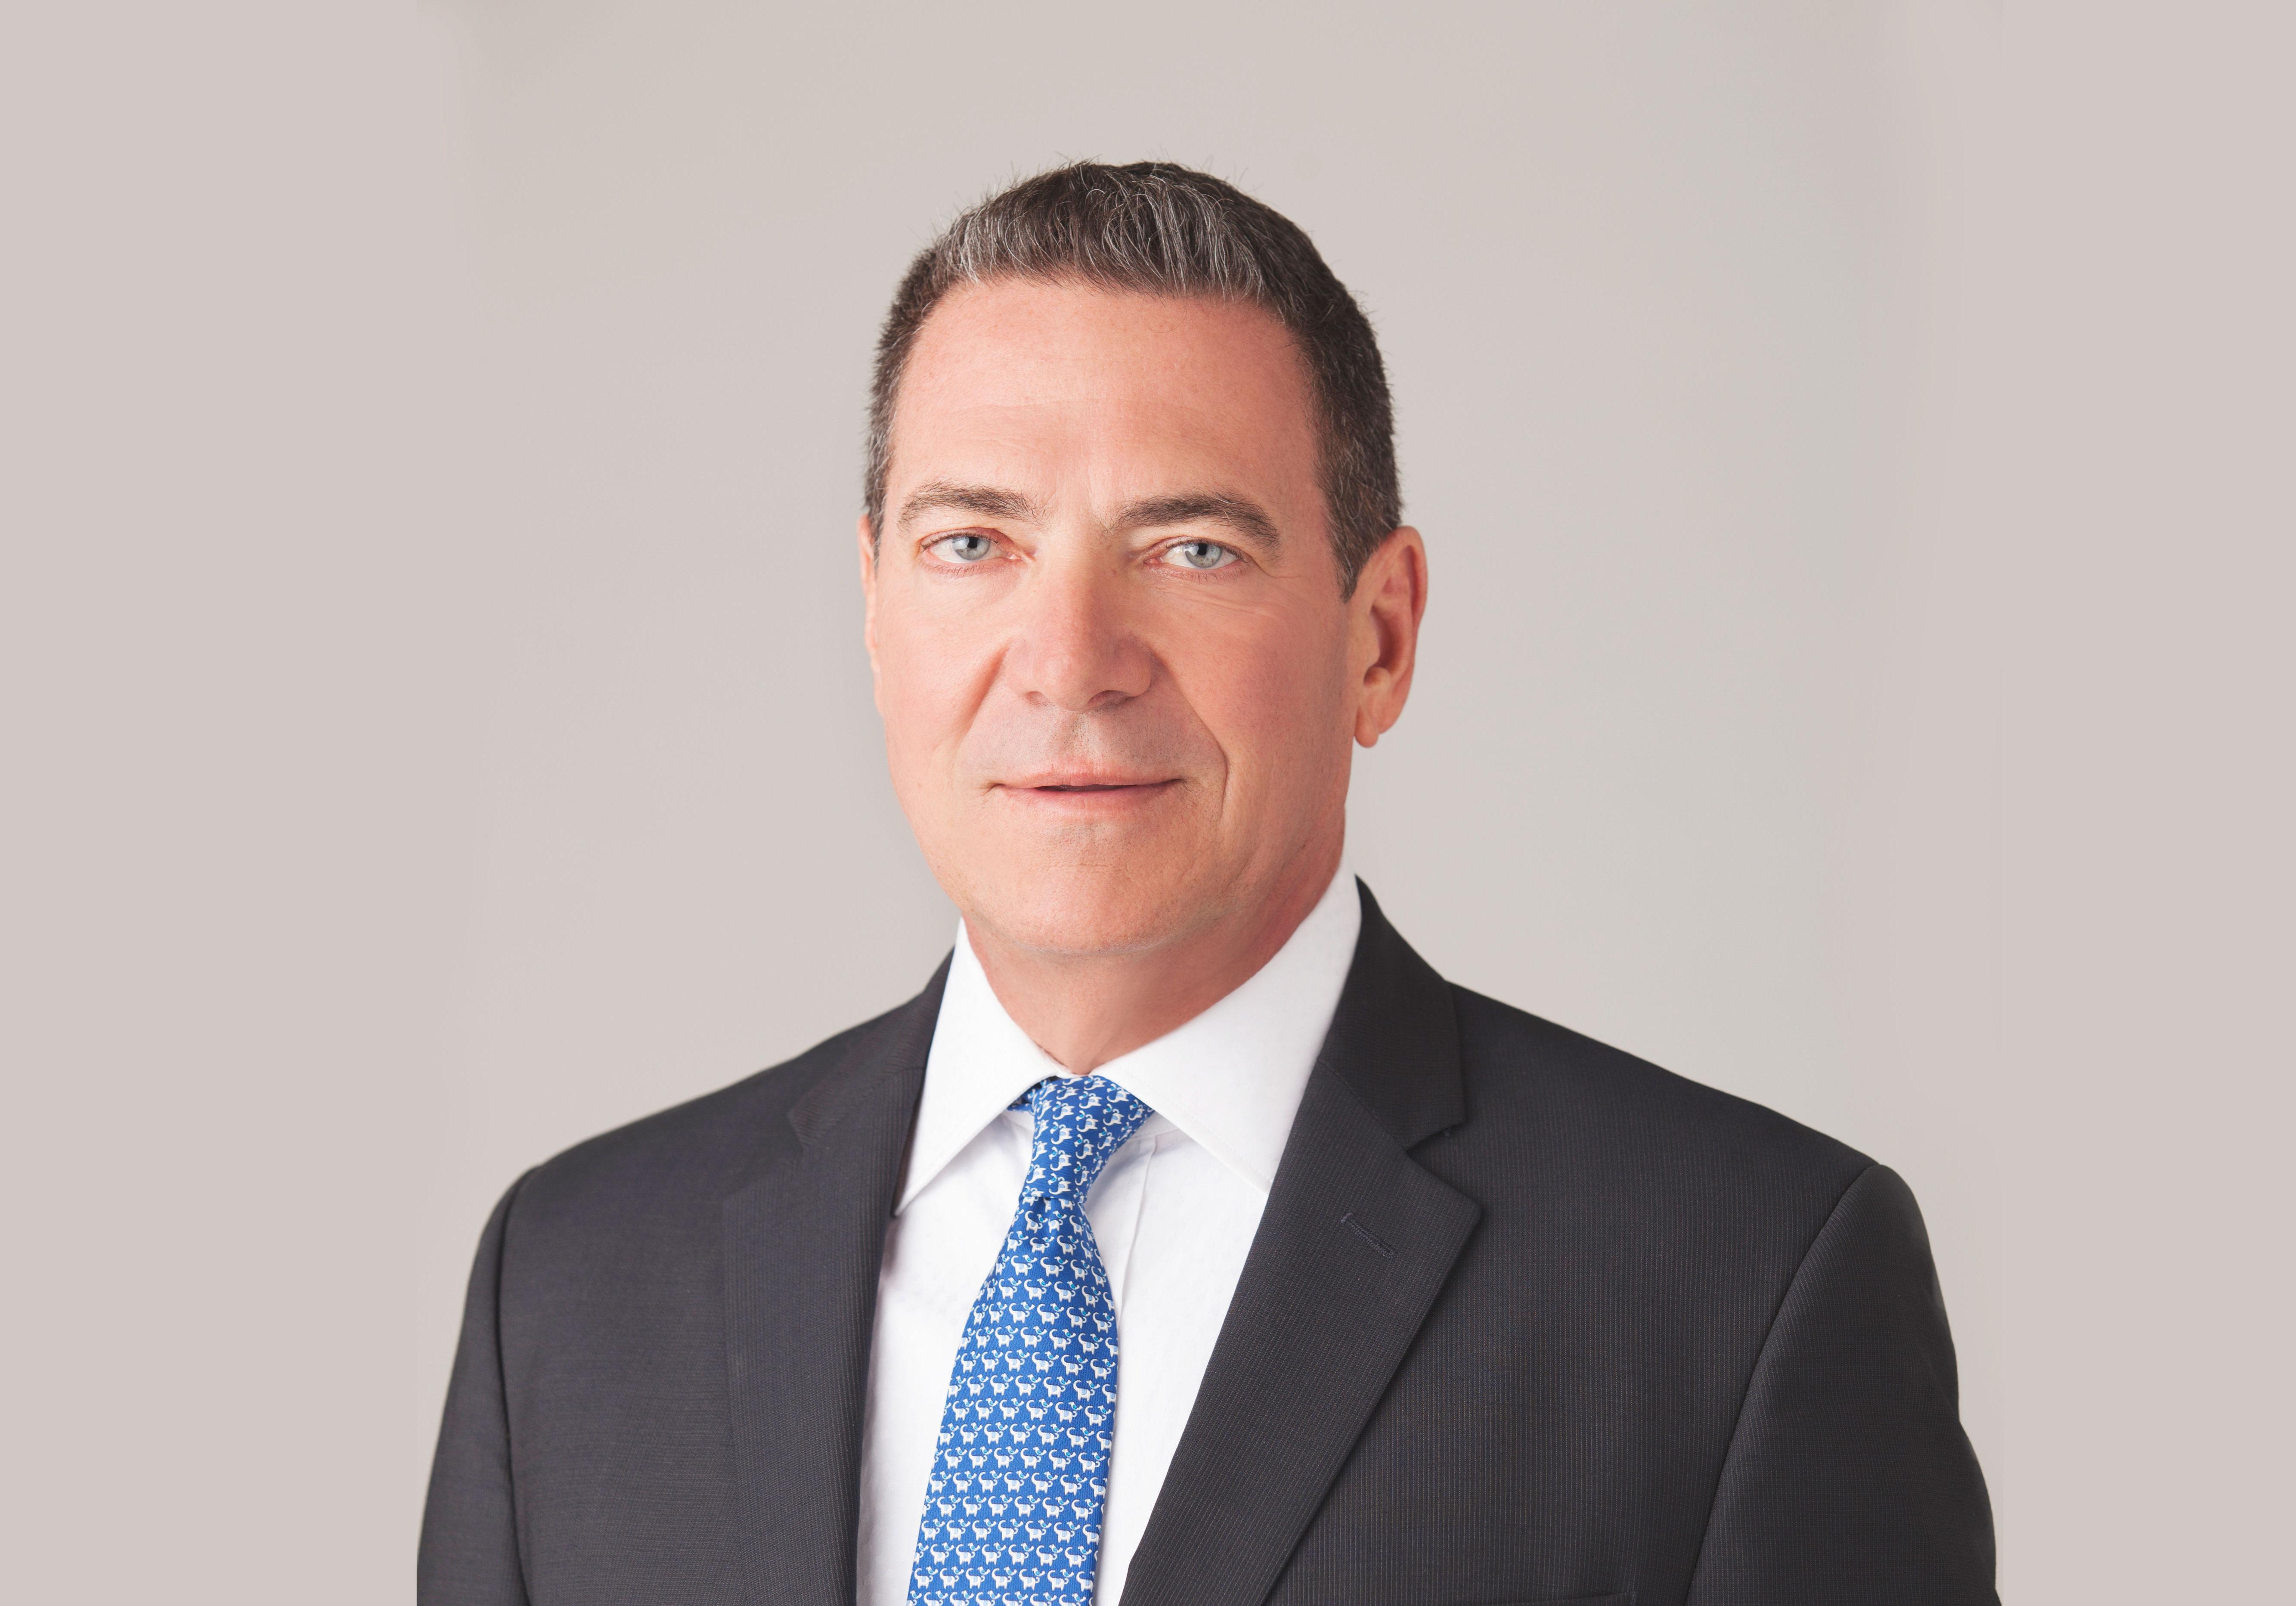 Michael Cingari<br>Las Vegas, NV